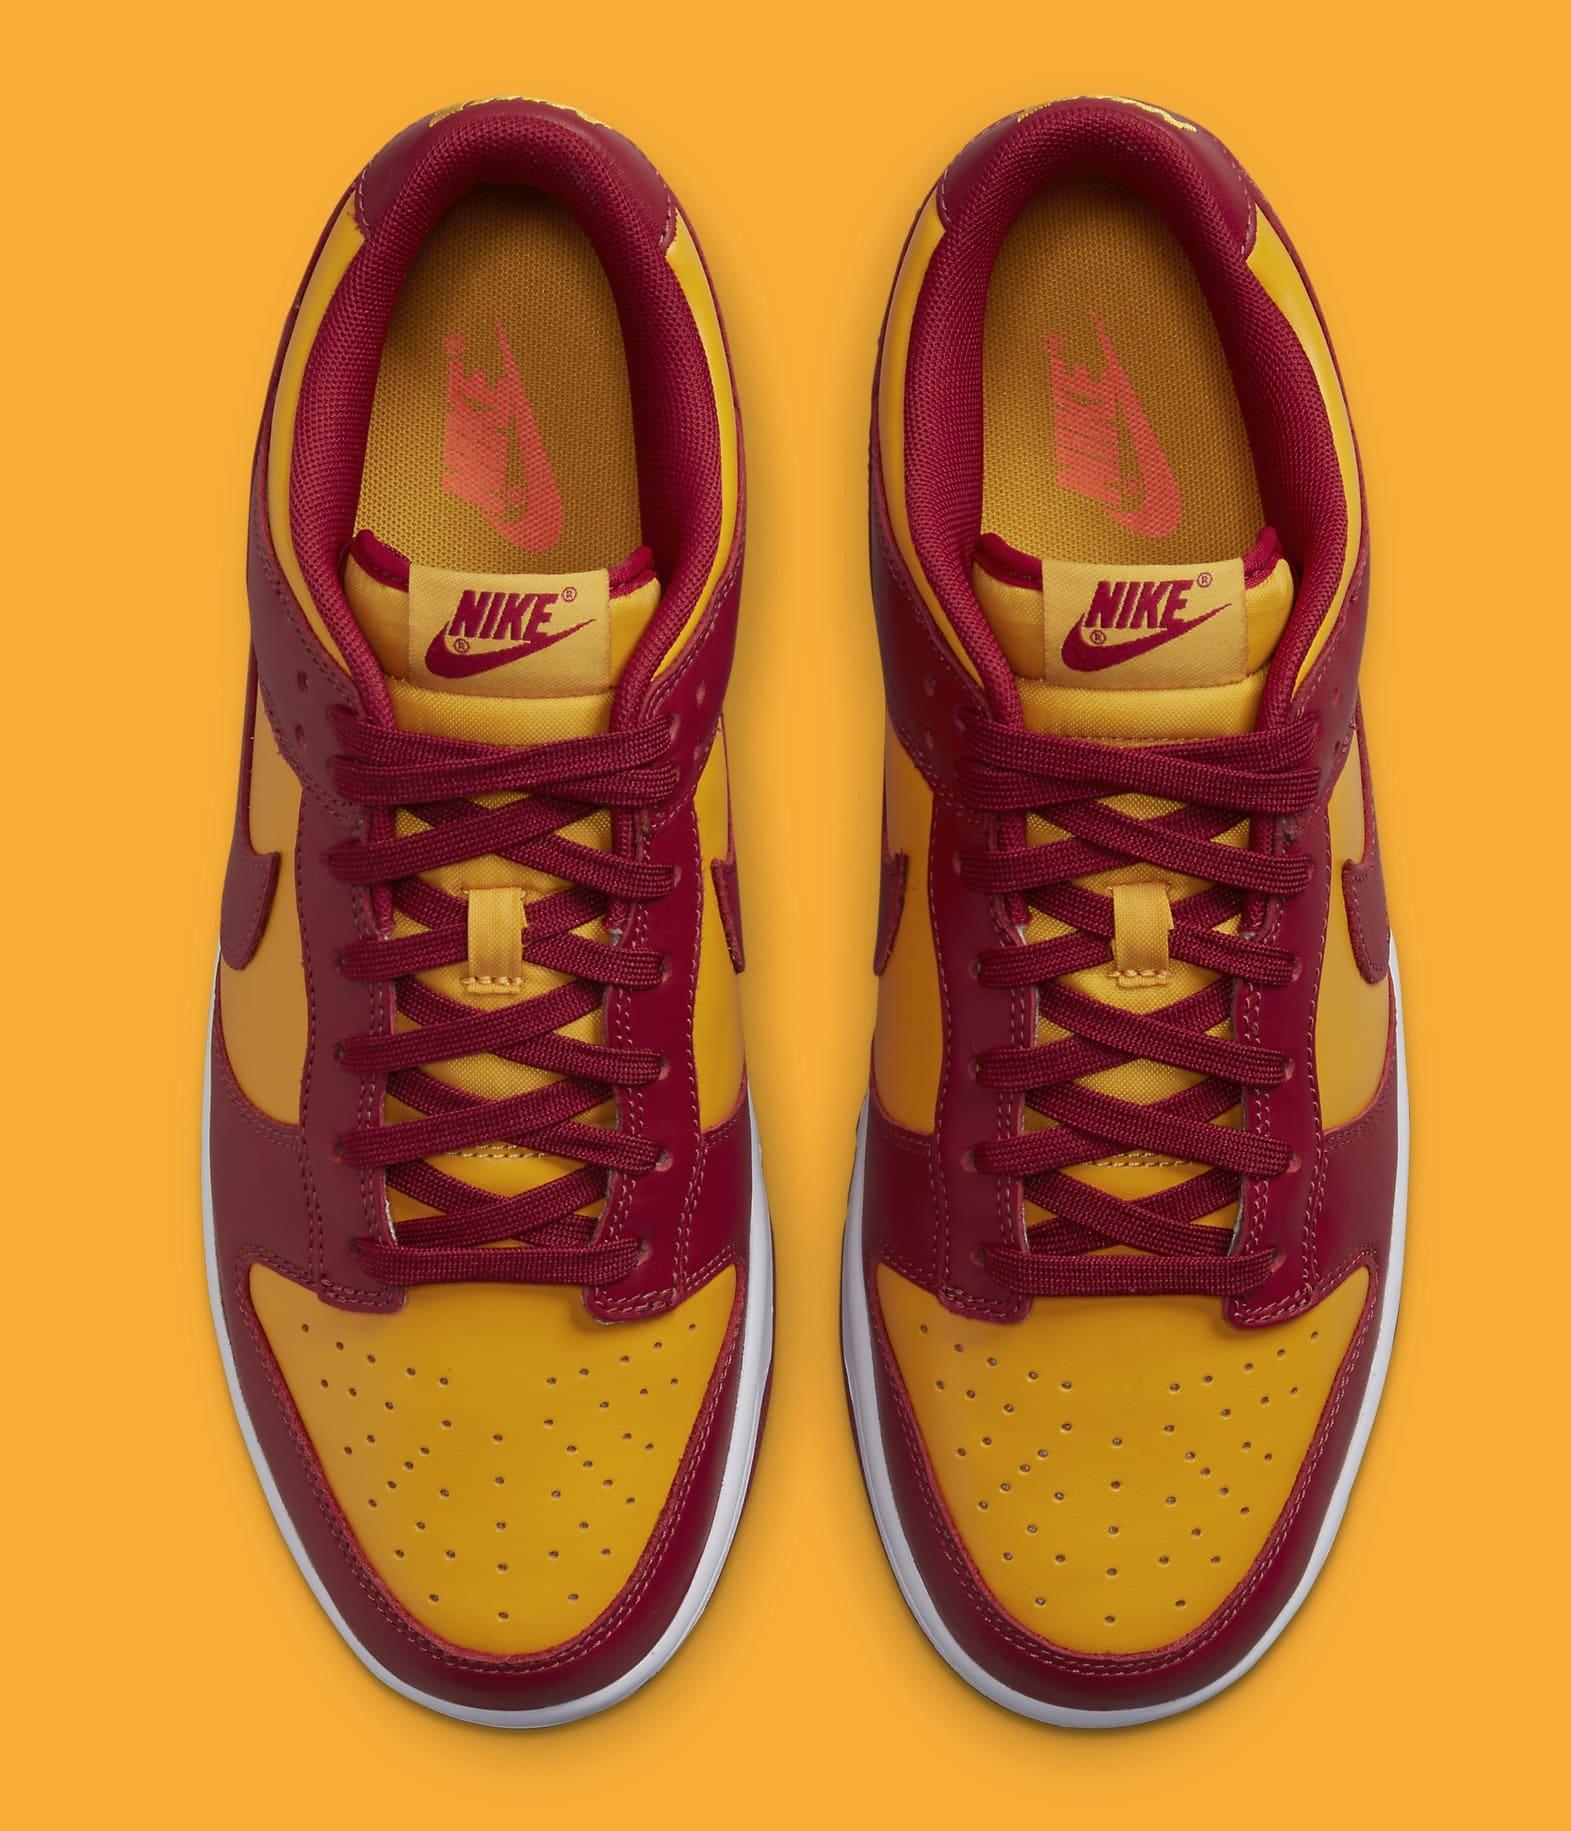 Nike Dunk Low 'Midas Gold' DD1391-701 Top